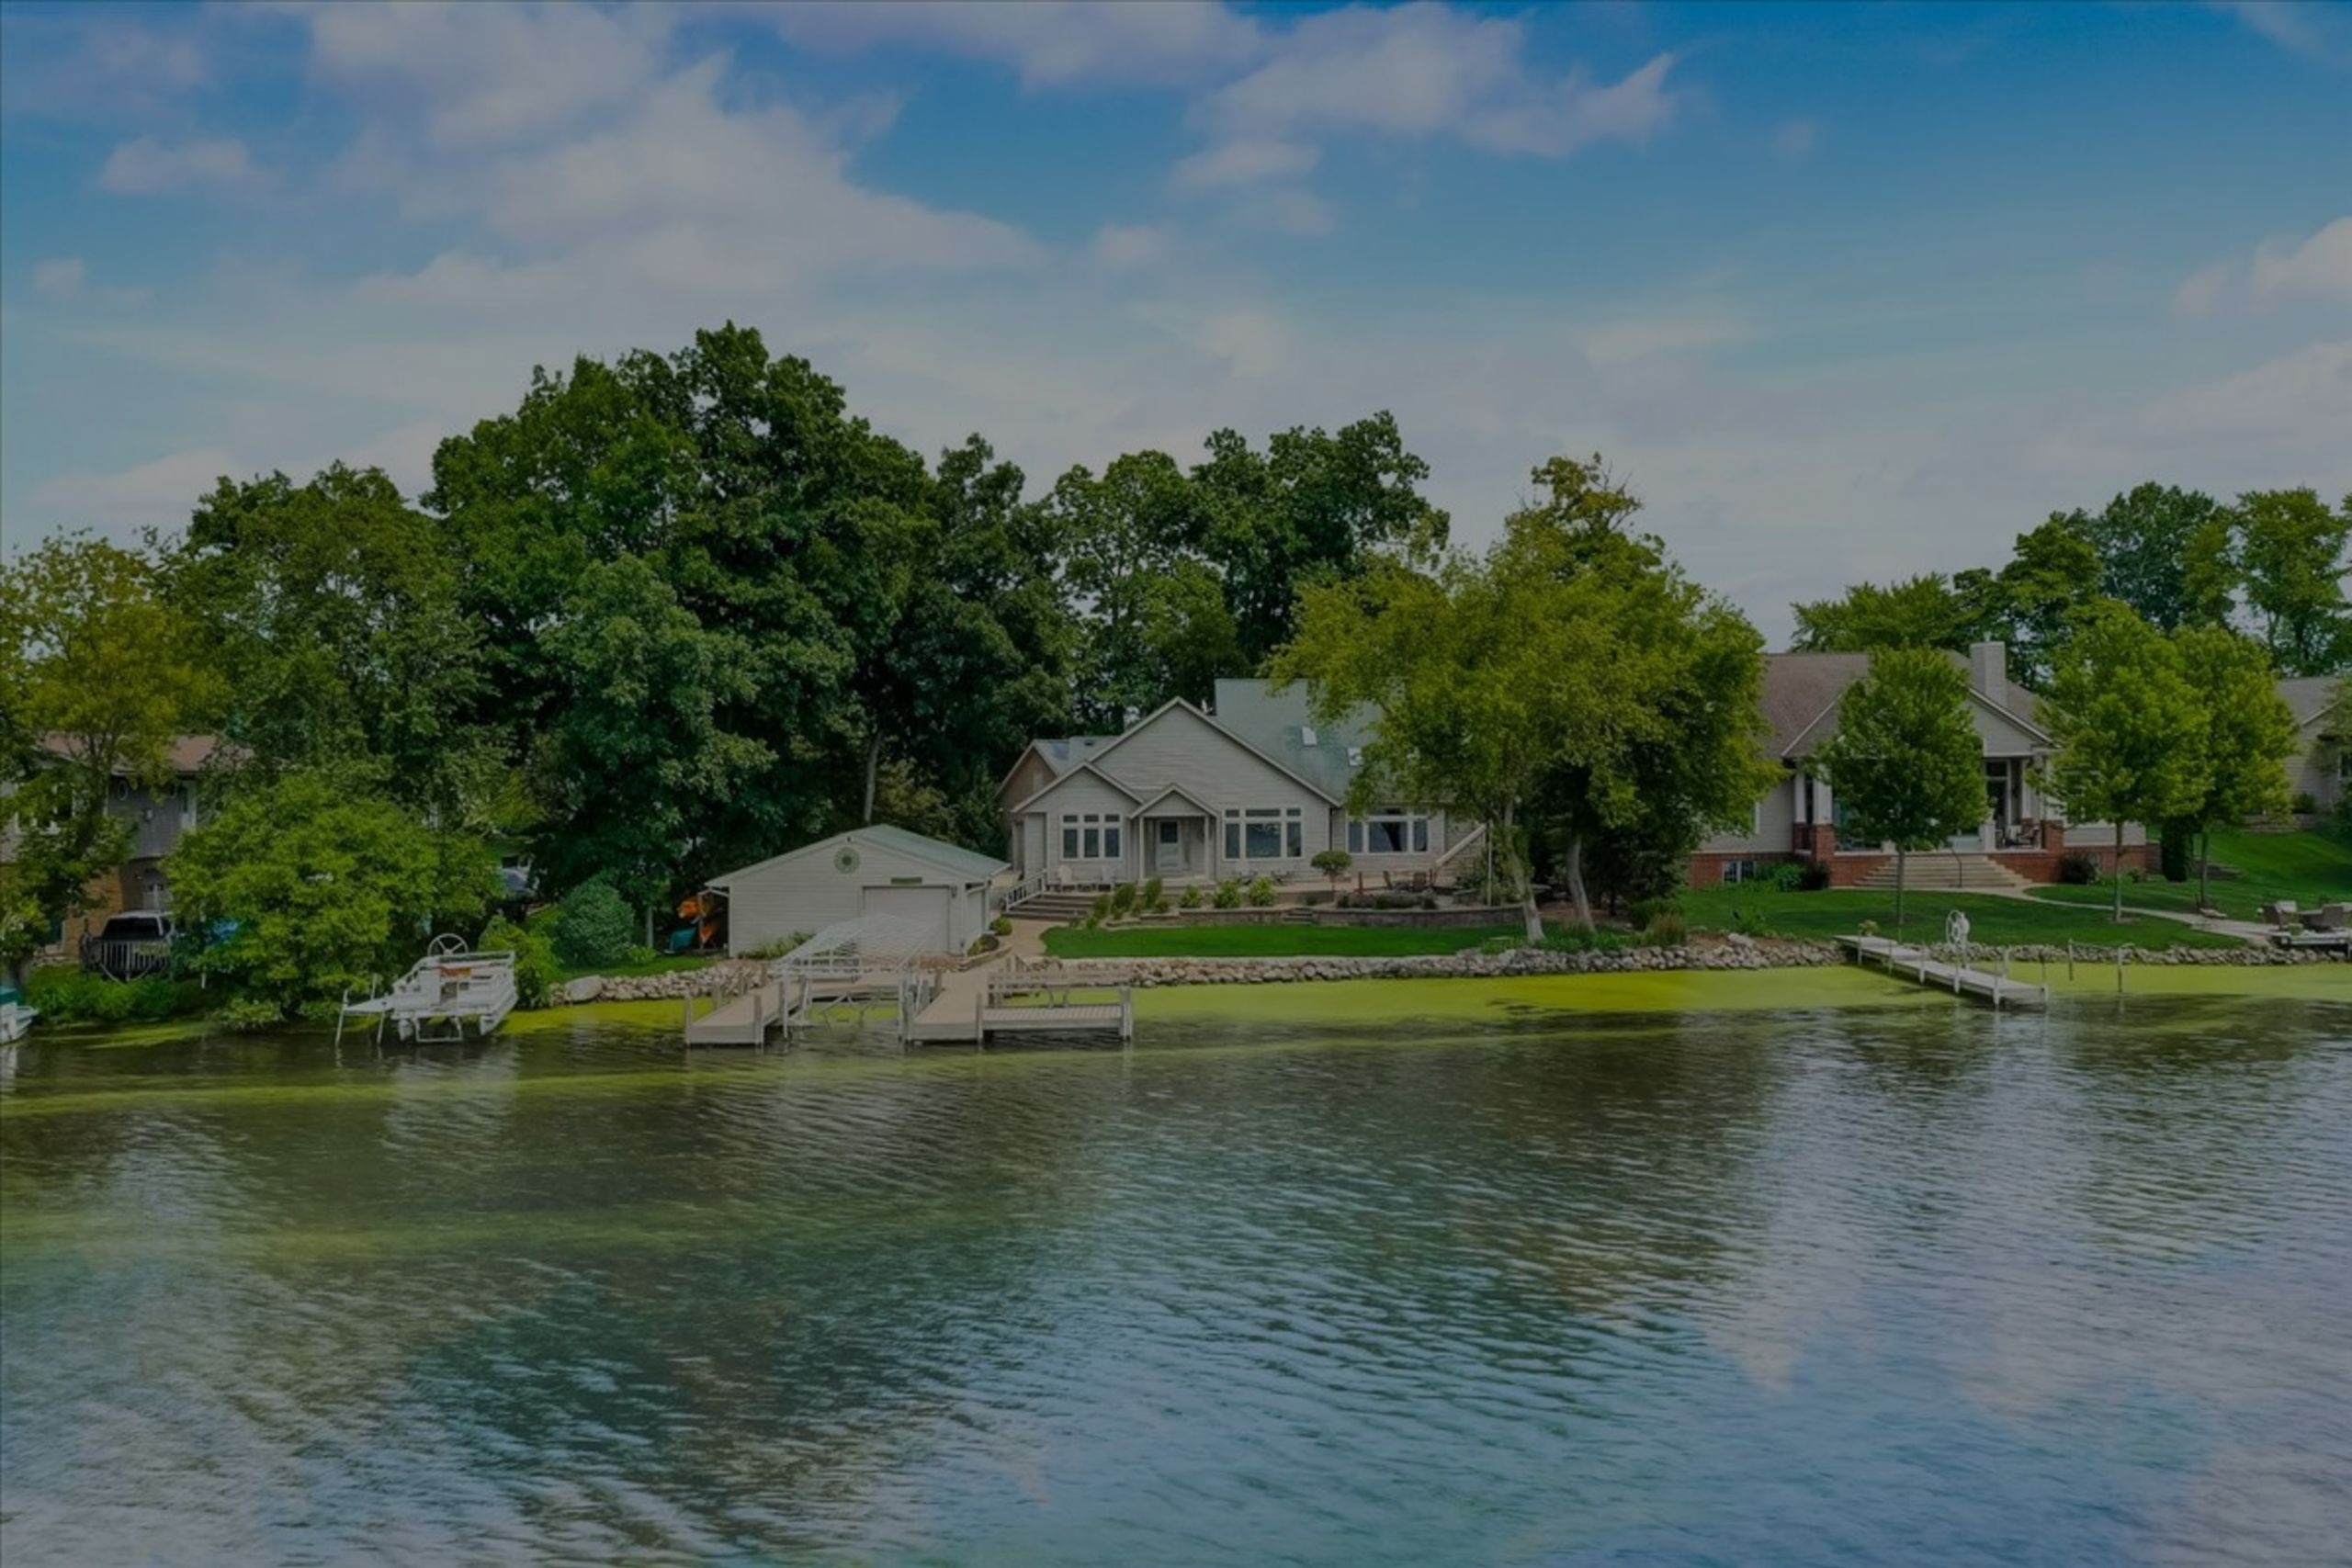 COMING SOON – 636 Oak Lodge Rd. Waterford, WI 53185